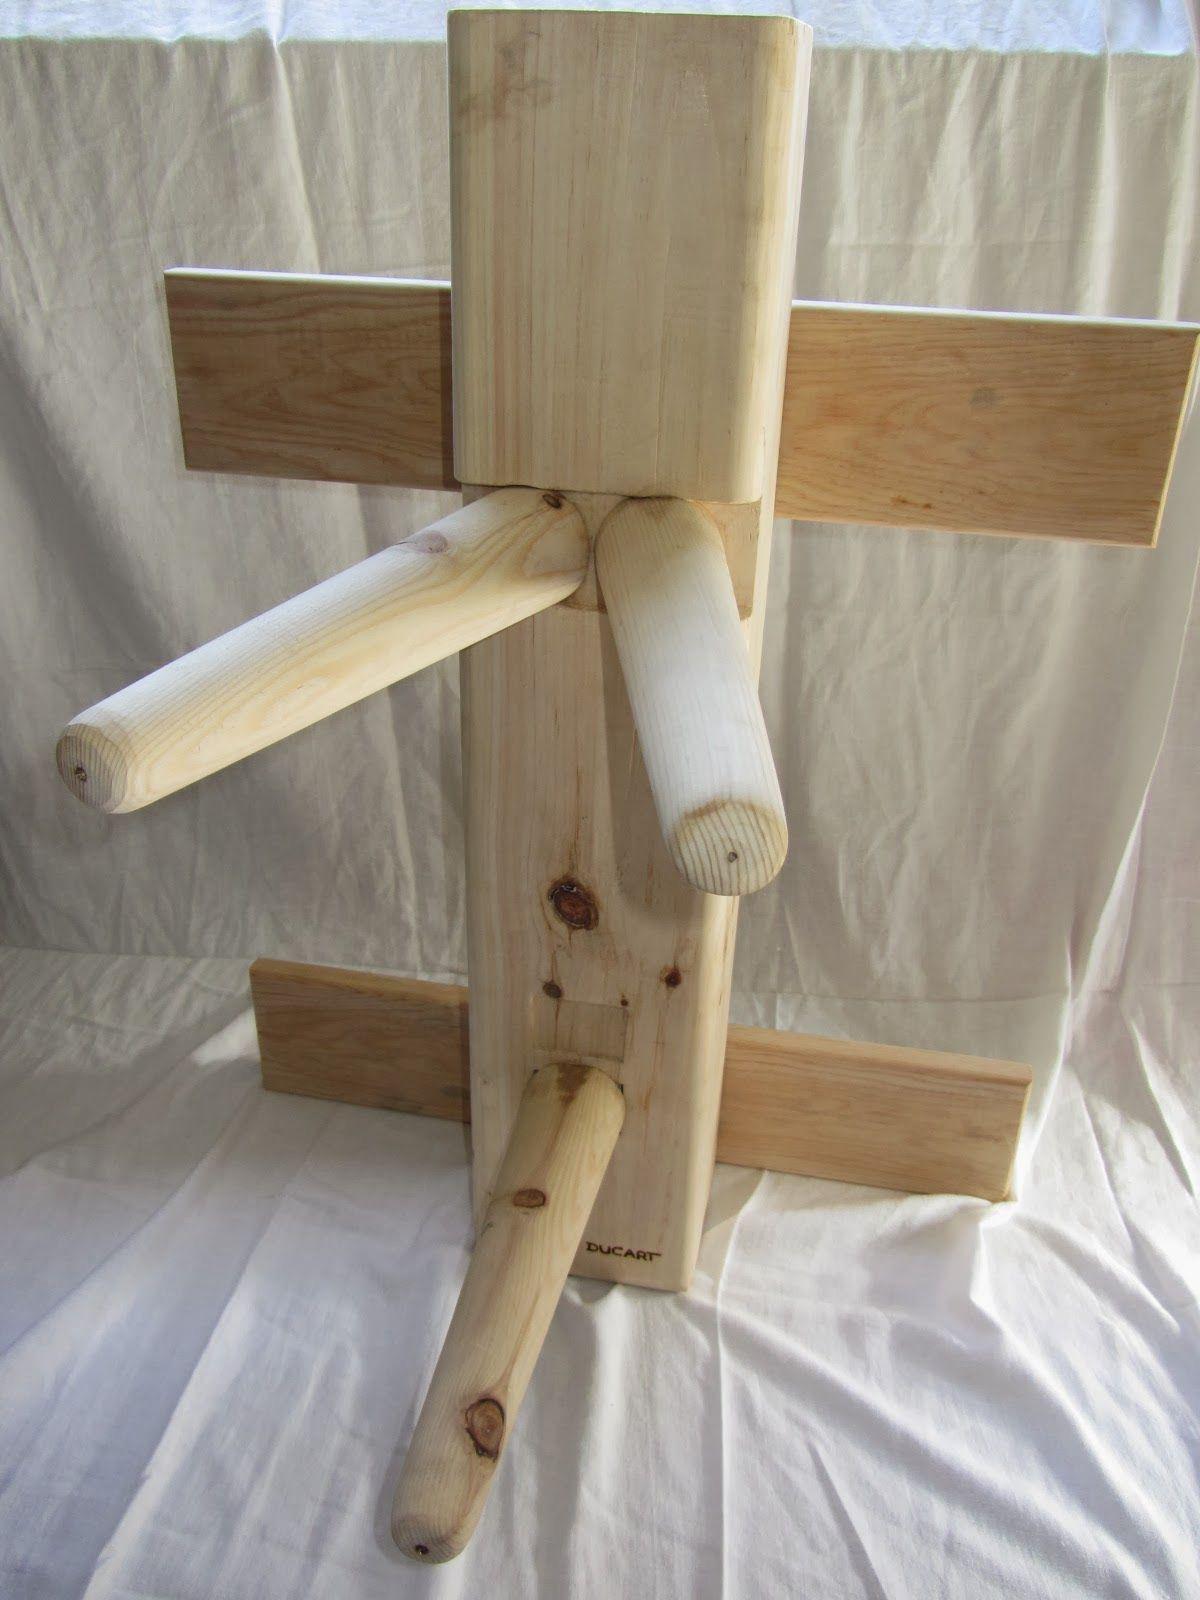 Idea by pistoleros on martial training sciences wooden